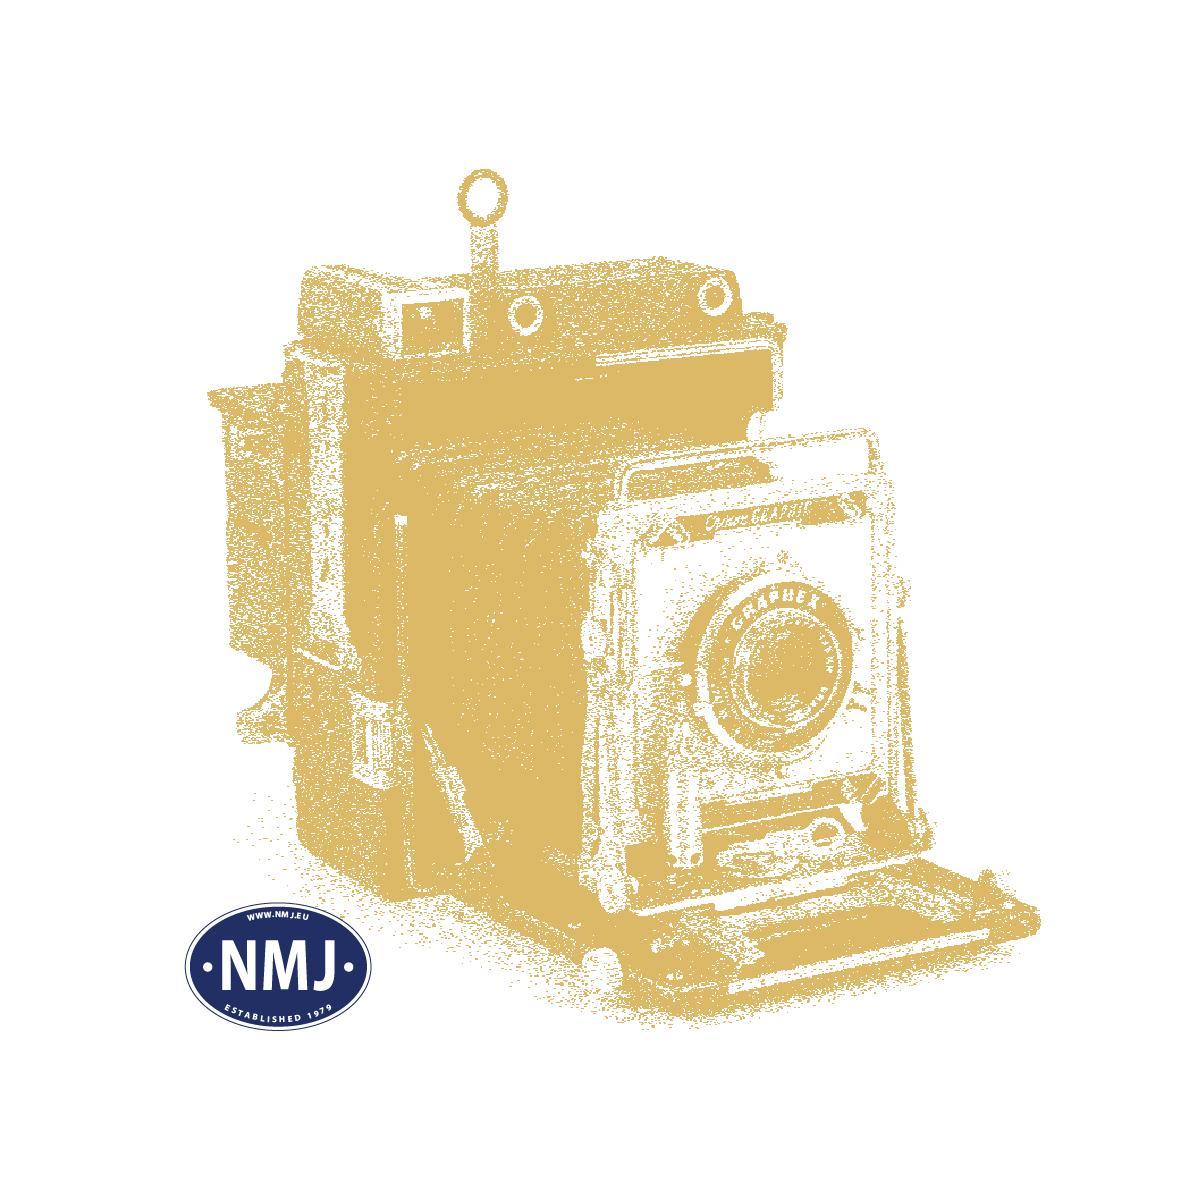 NMJT105.990 - NMJ Topline NSB B3 series DCC interior light set